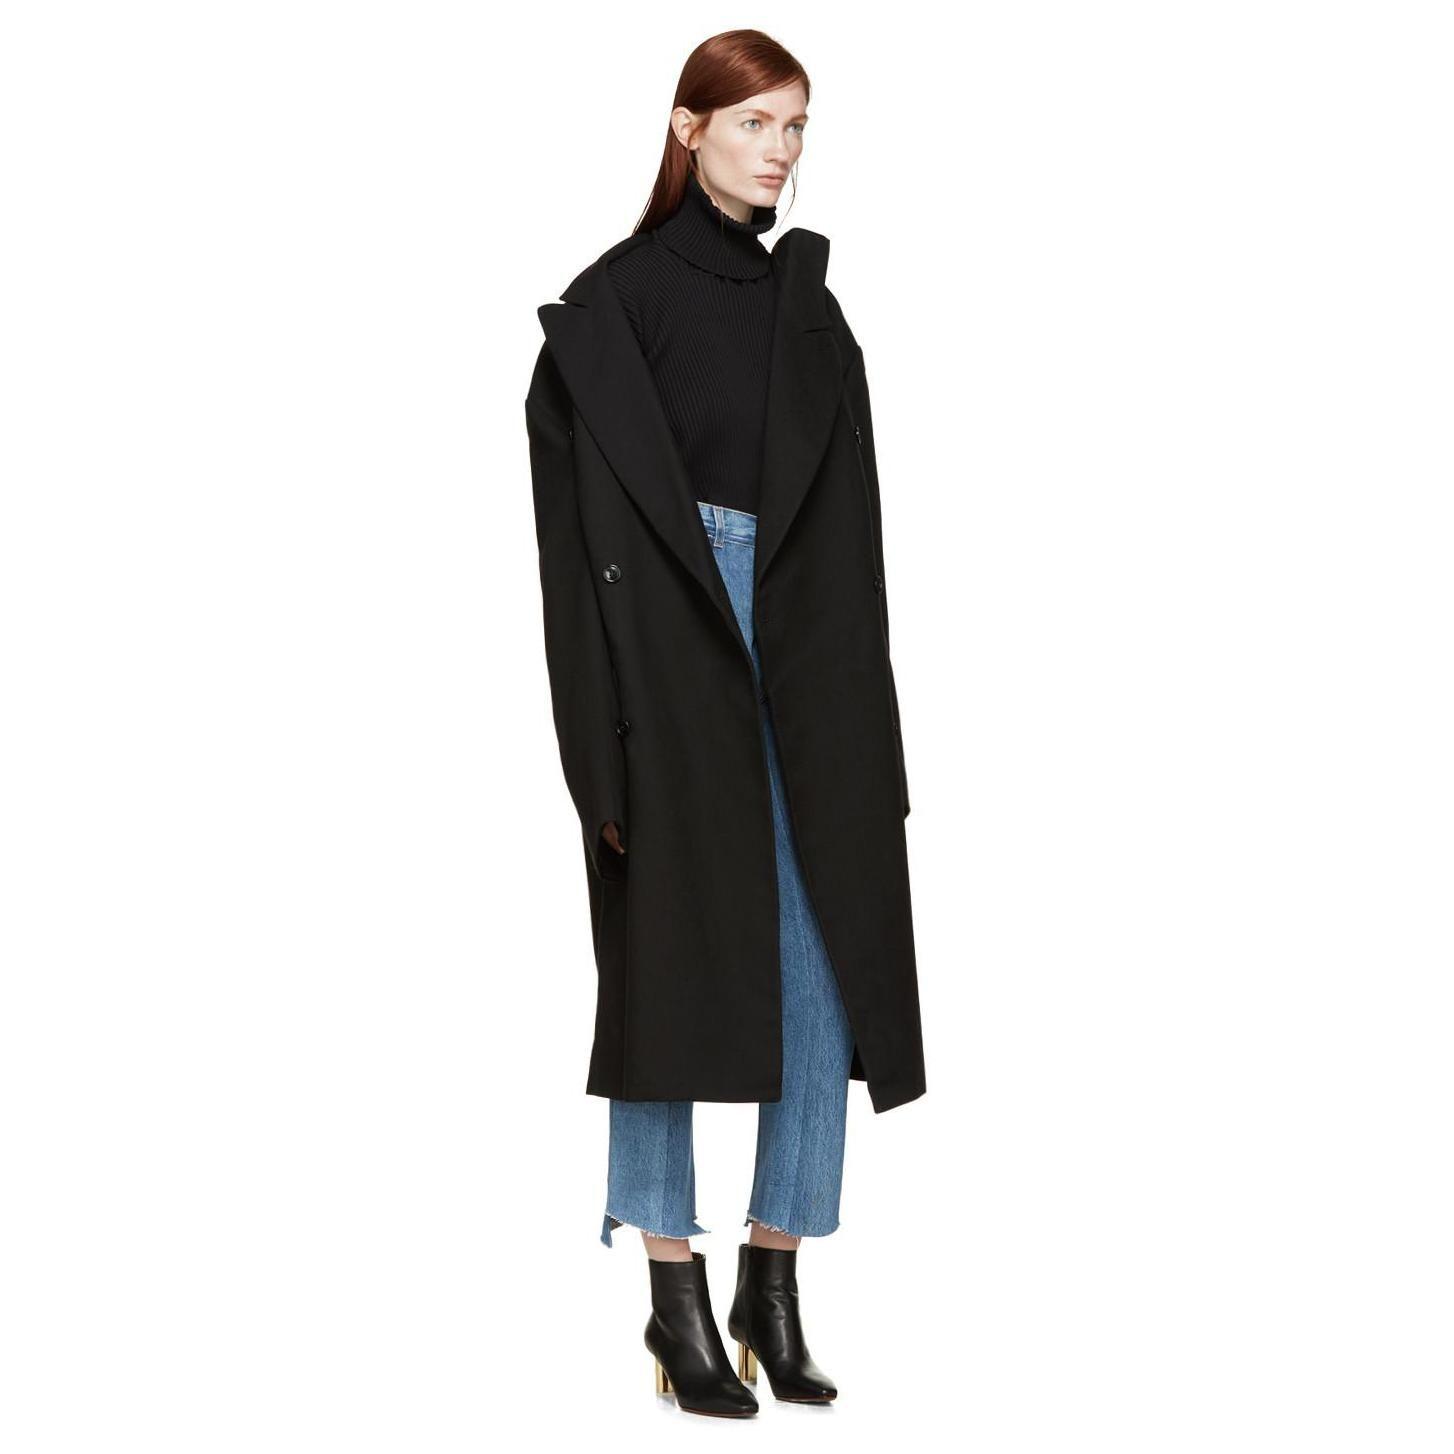 Oversized Wool Coat Womens v0tFX1 | - things i want - | Pinterest ...